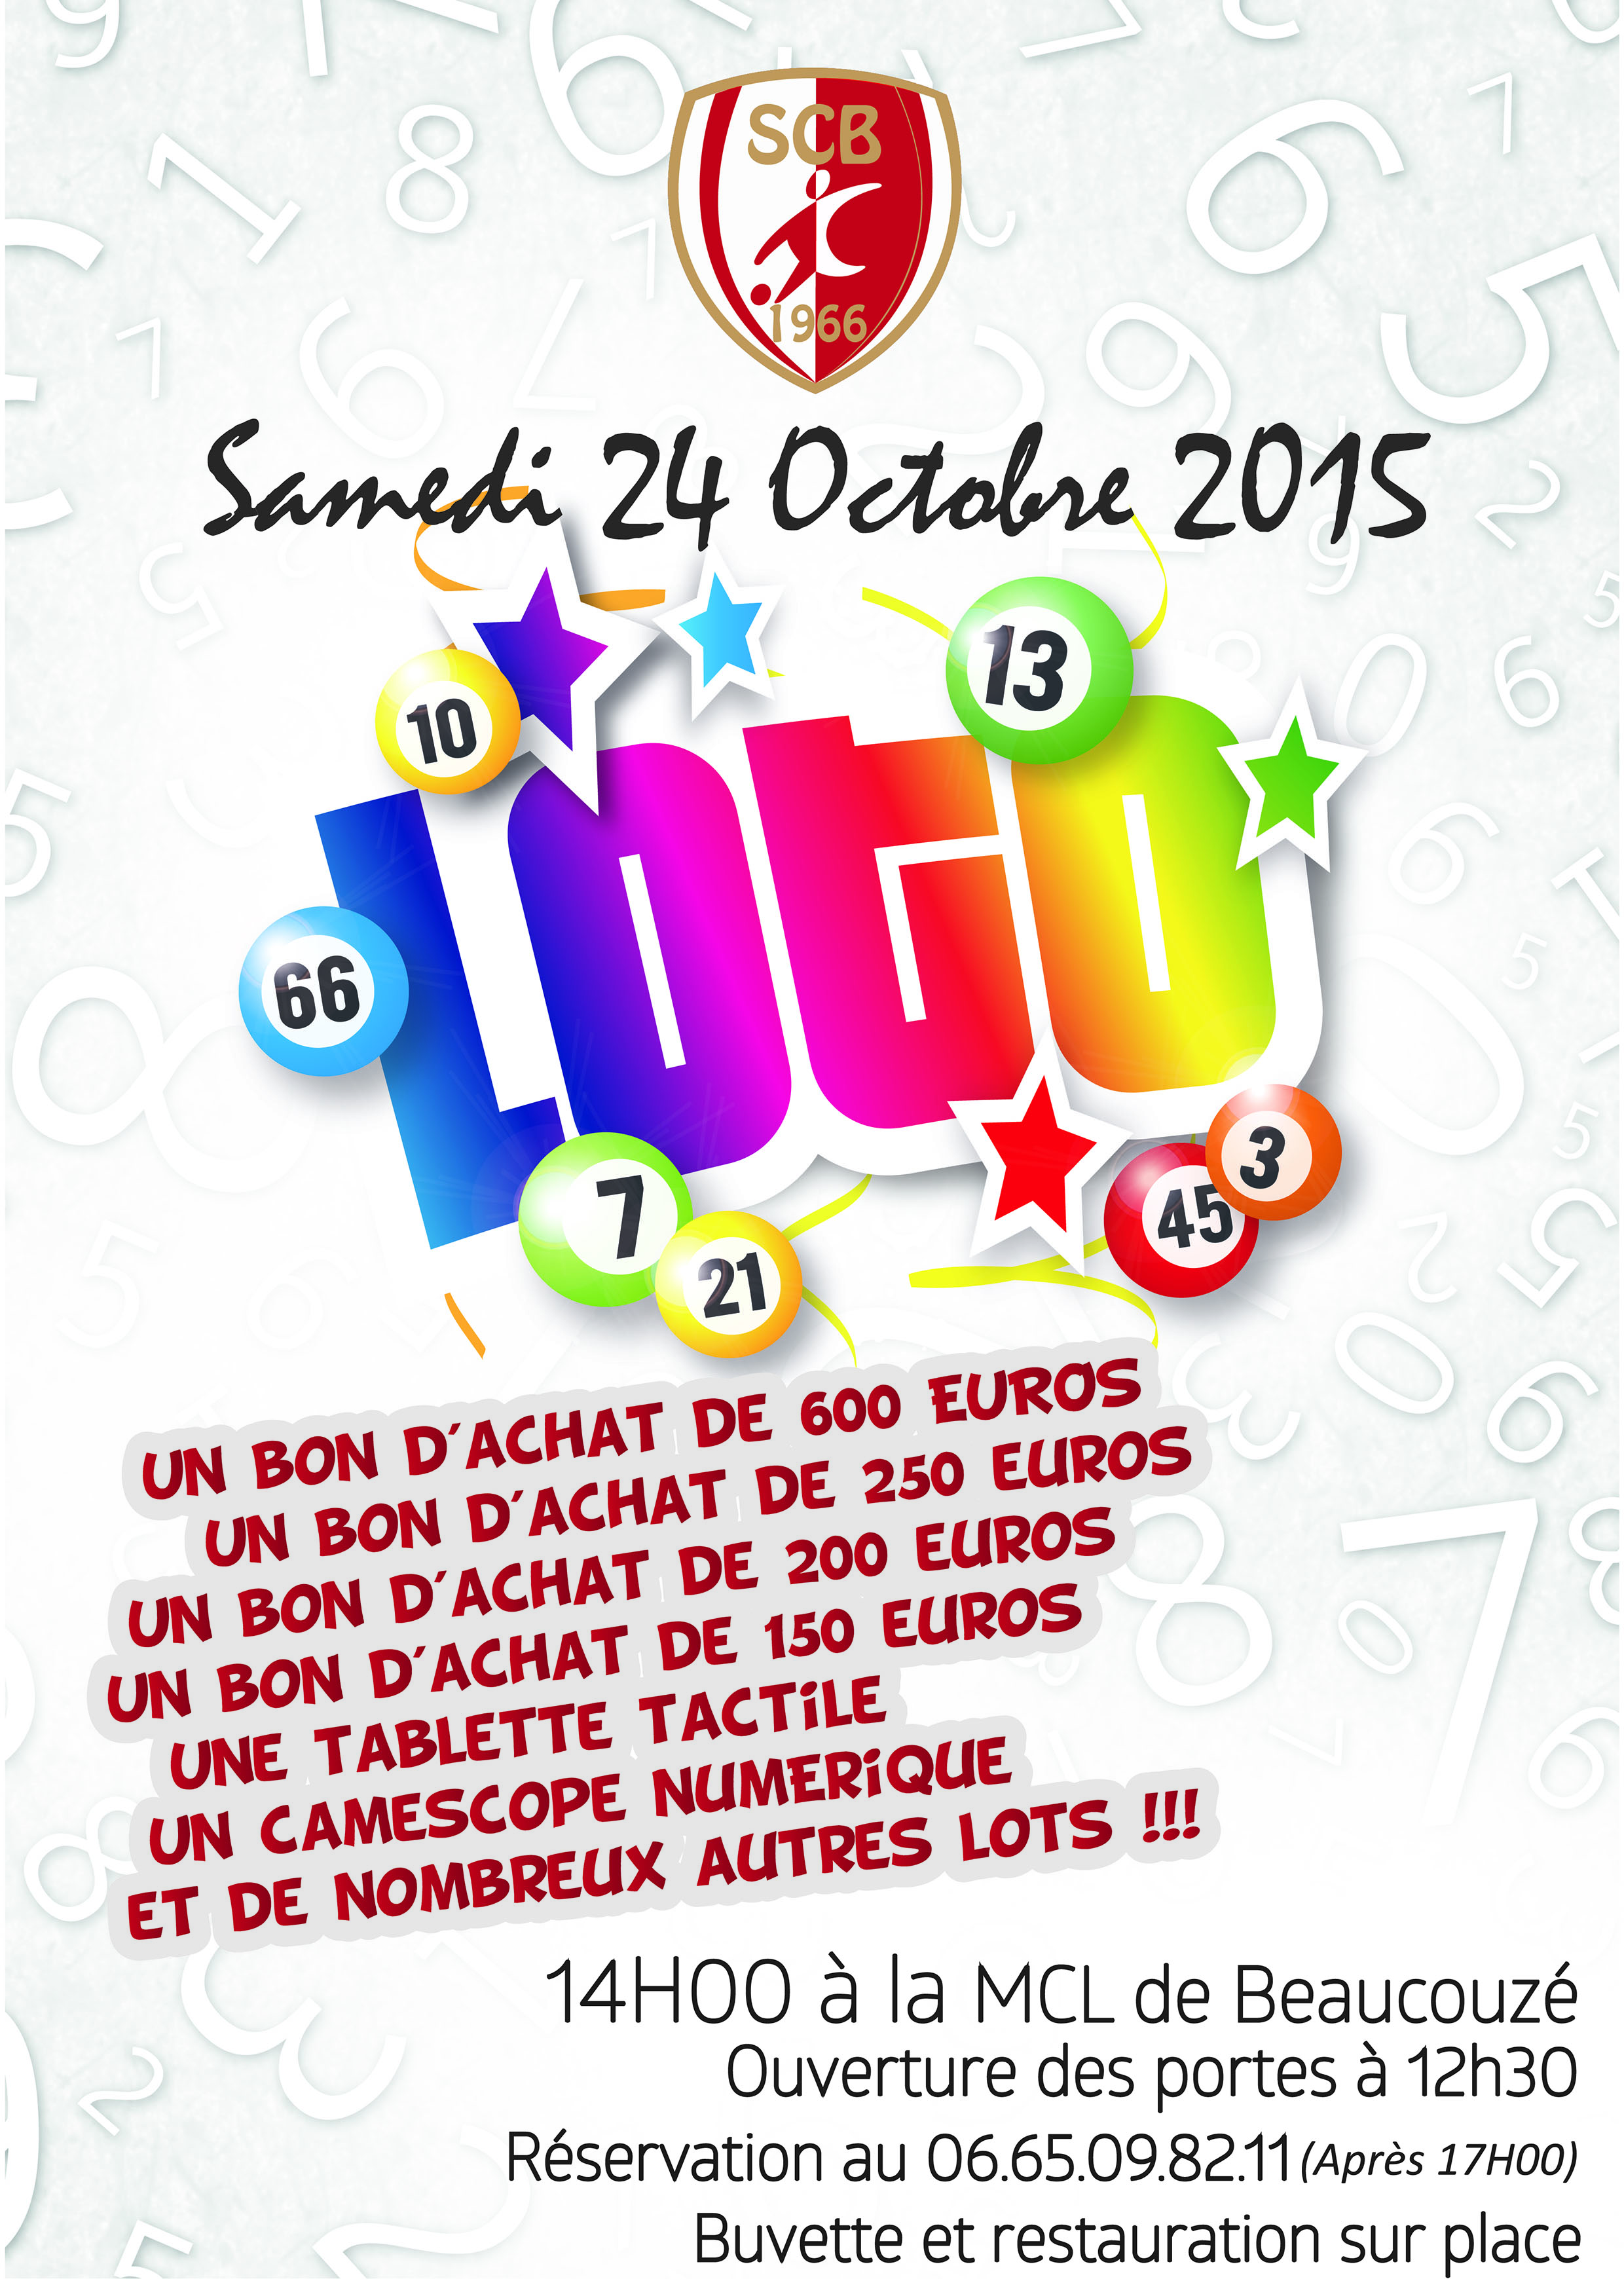 Super Loto / Soirée Bretonne, Samedi 24 Octobre 2015